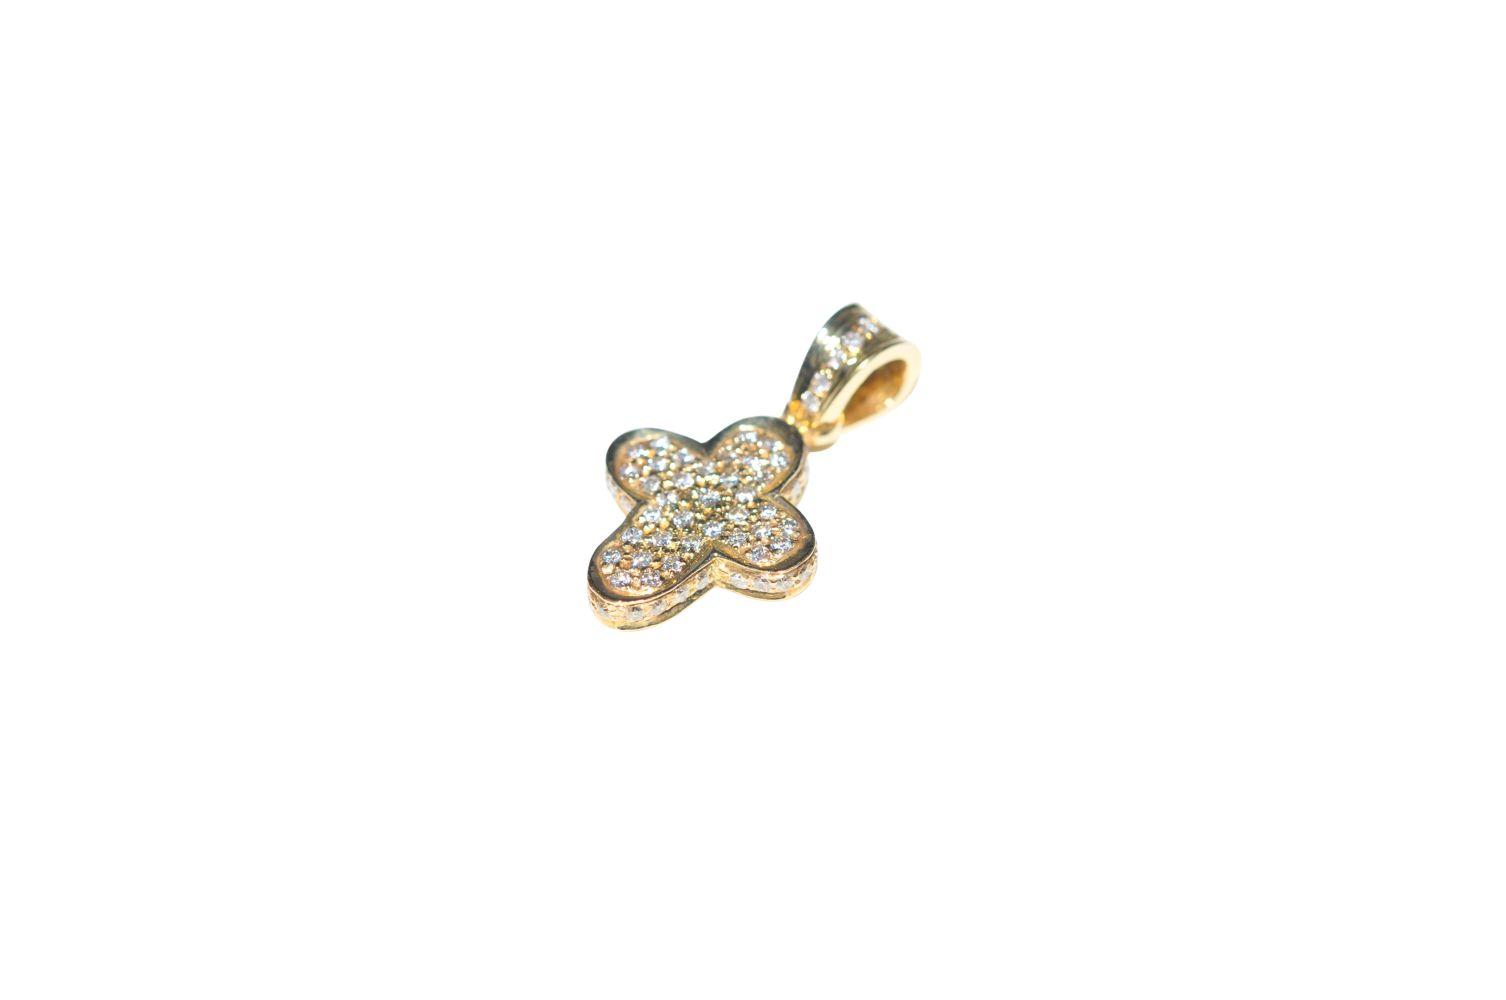 #100 Diamond cross pendant | Diamant-Kreuz-Anhänger Image